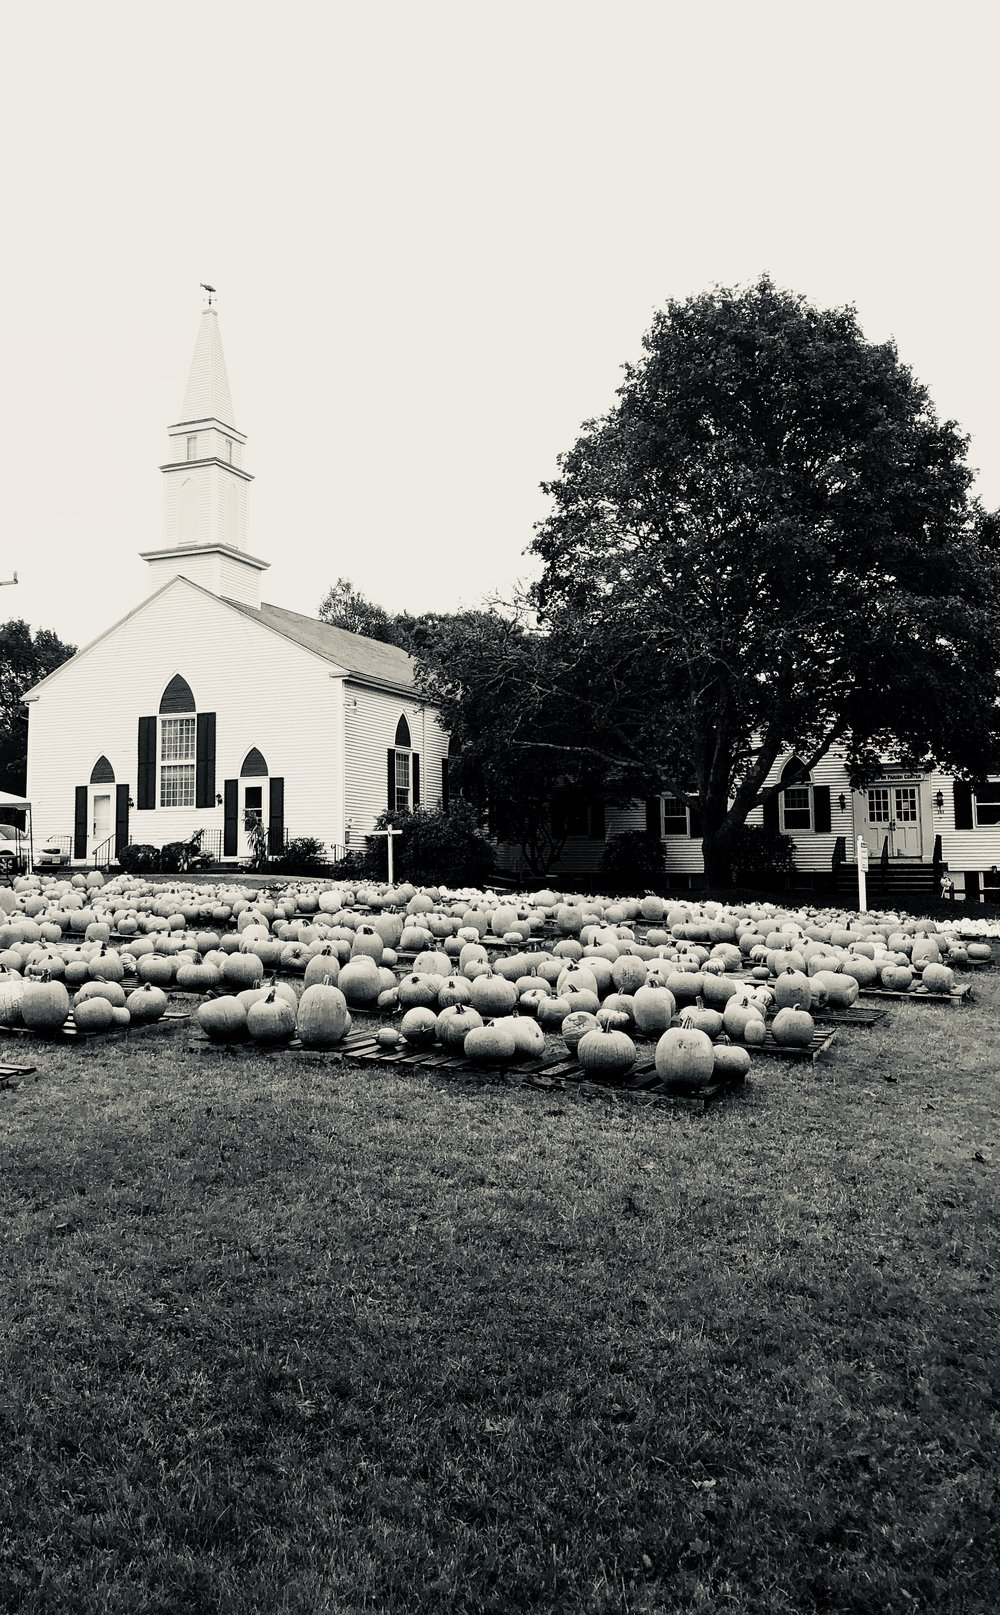 SOUTH YARMOUTH, MA OCTOBER 2017